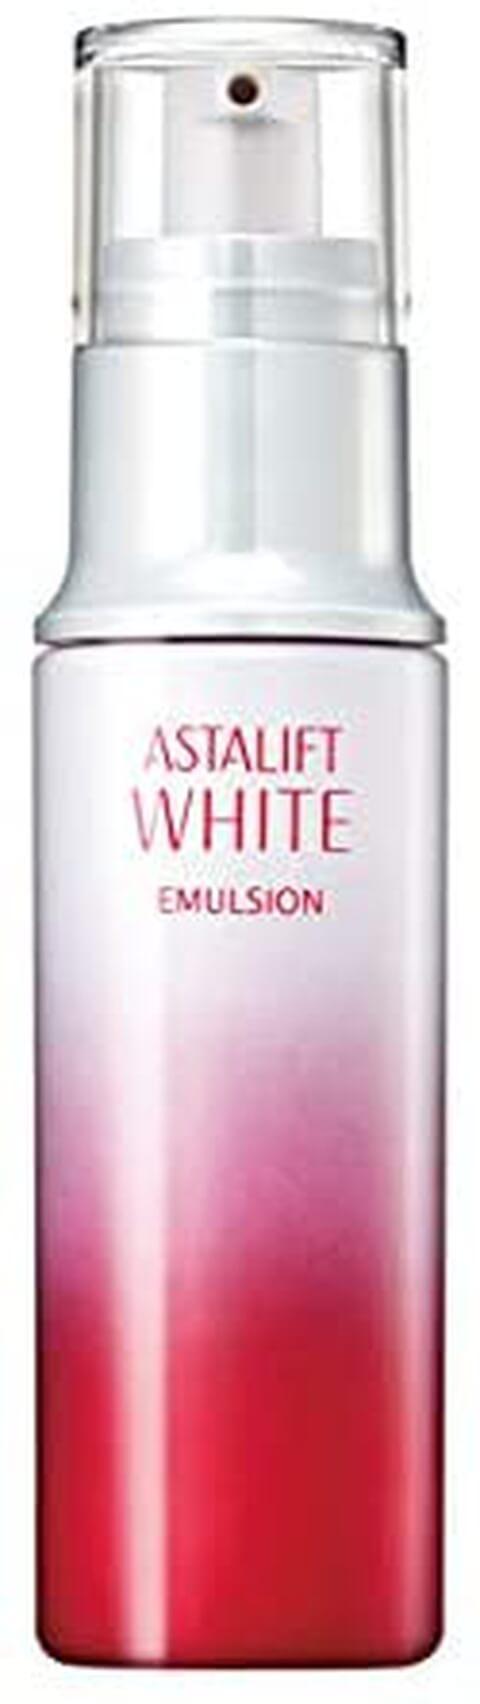 astalift-whiteemulsion